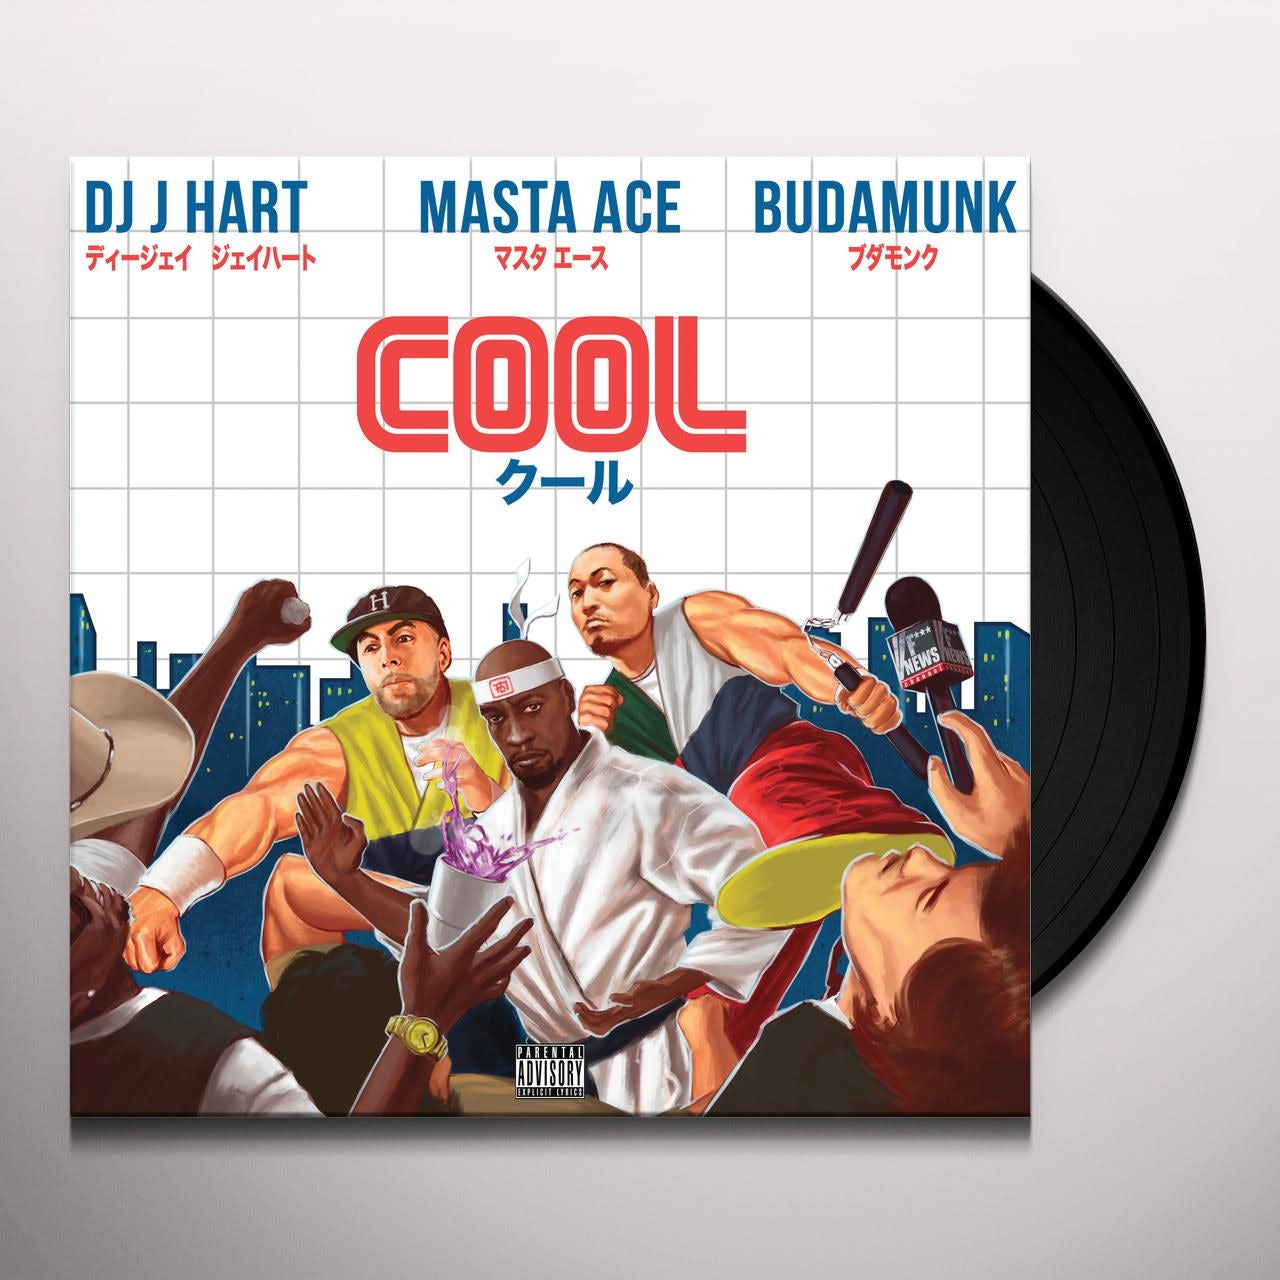 Dj J Hart / Masta Ace / Budamunk COOL / TRINITY Vinyl Record